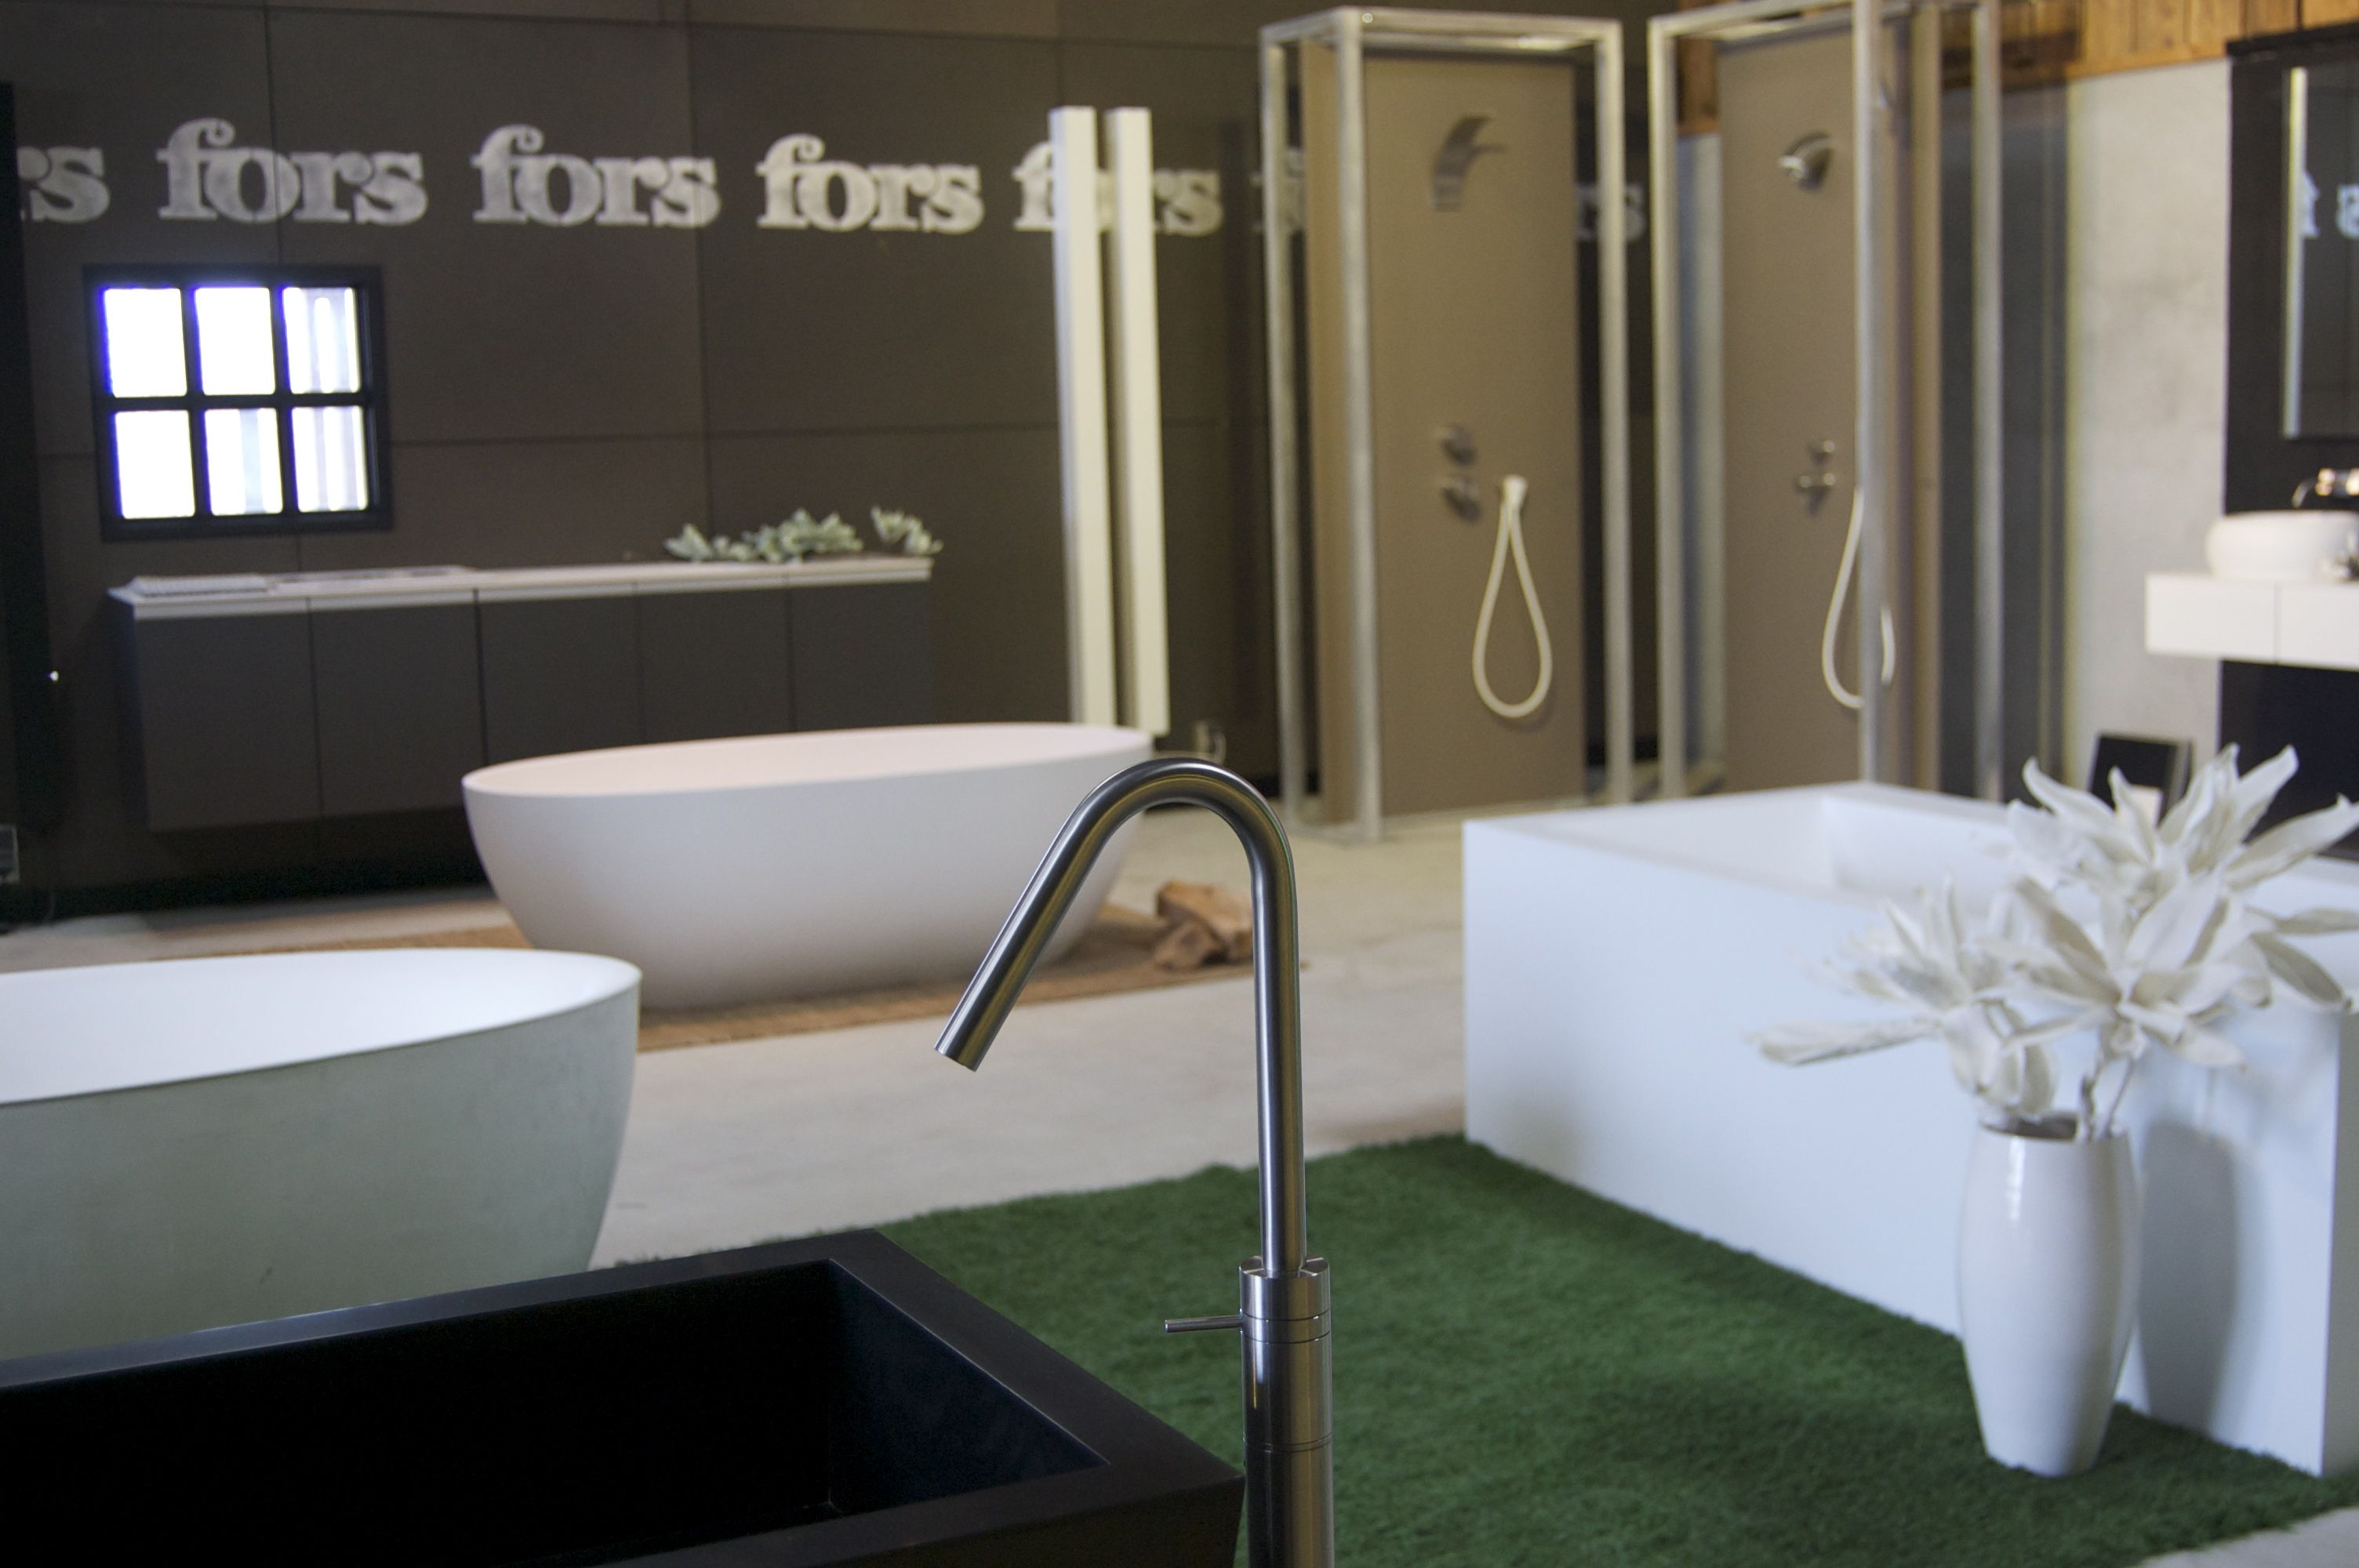 Design Badkamer Showroom : Showroom fors design breda fors design badkamers